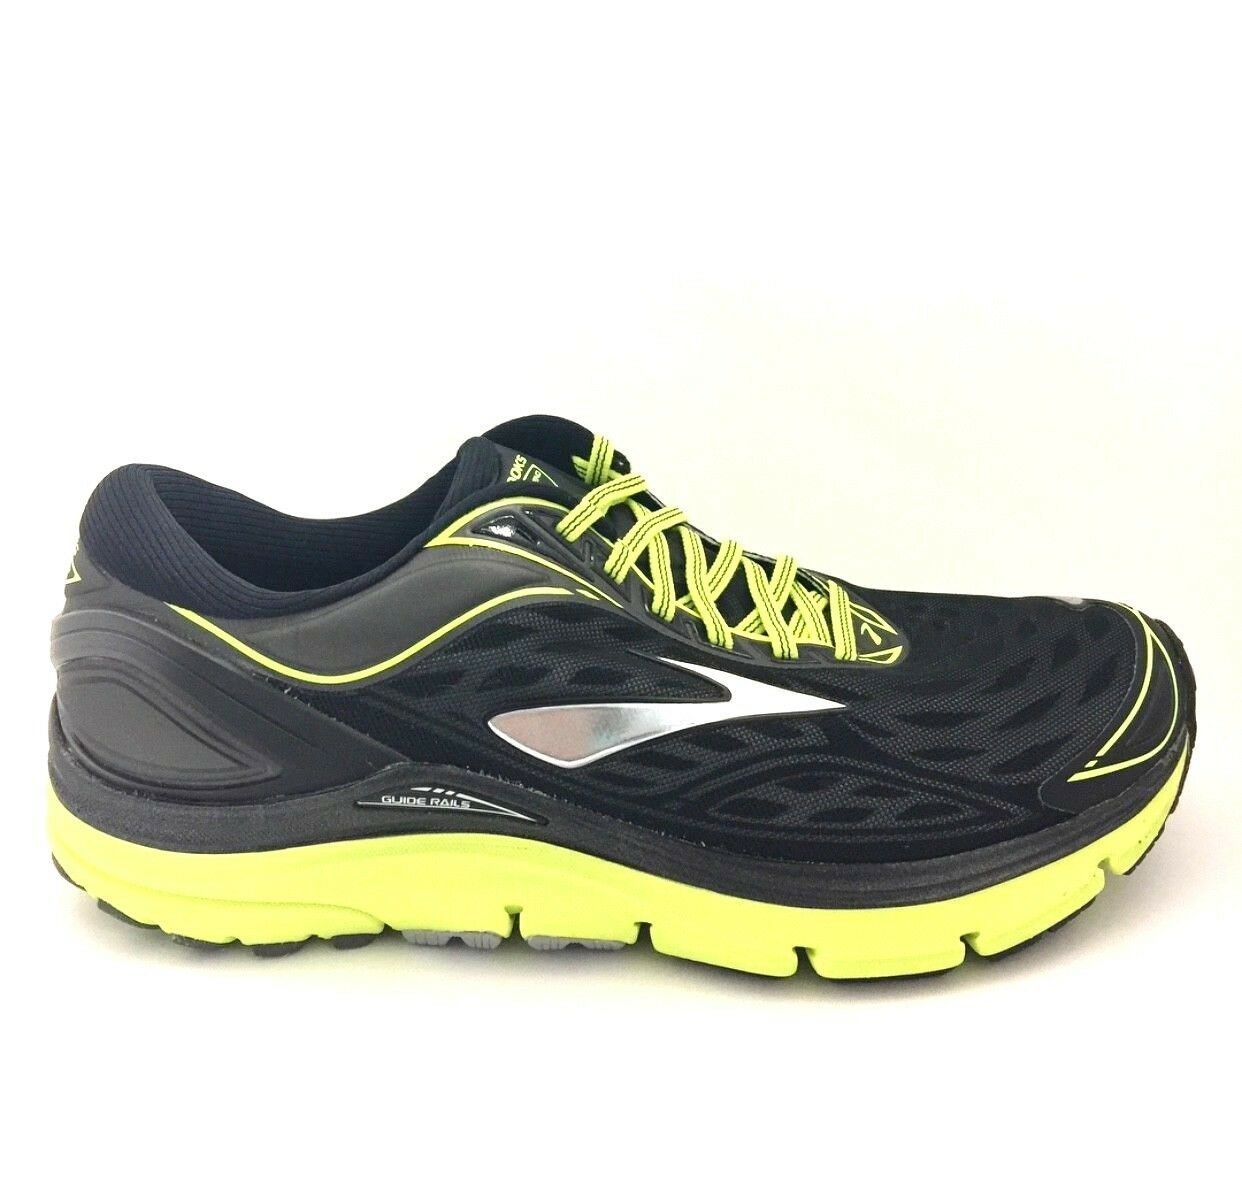 Brooks Transcend 3 Mens Running chaussures (D) (051)   BARGAIN